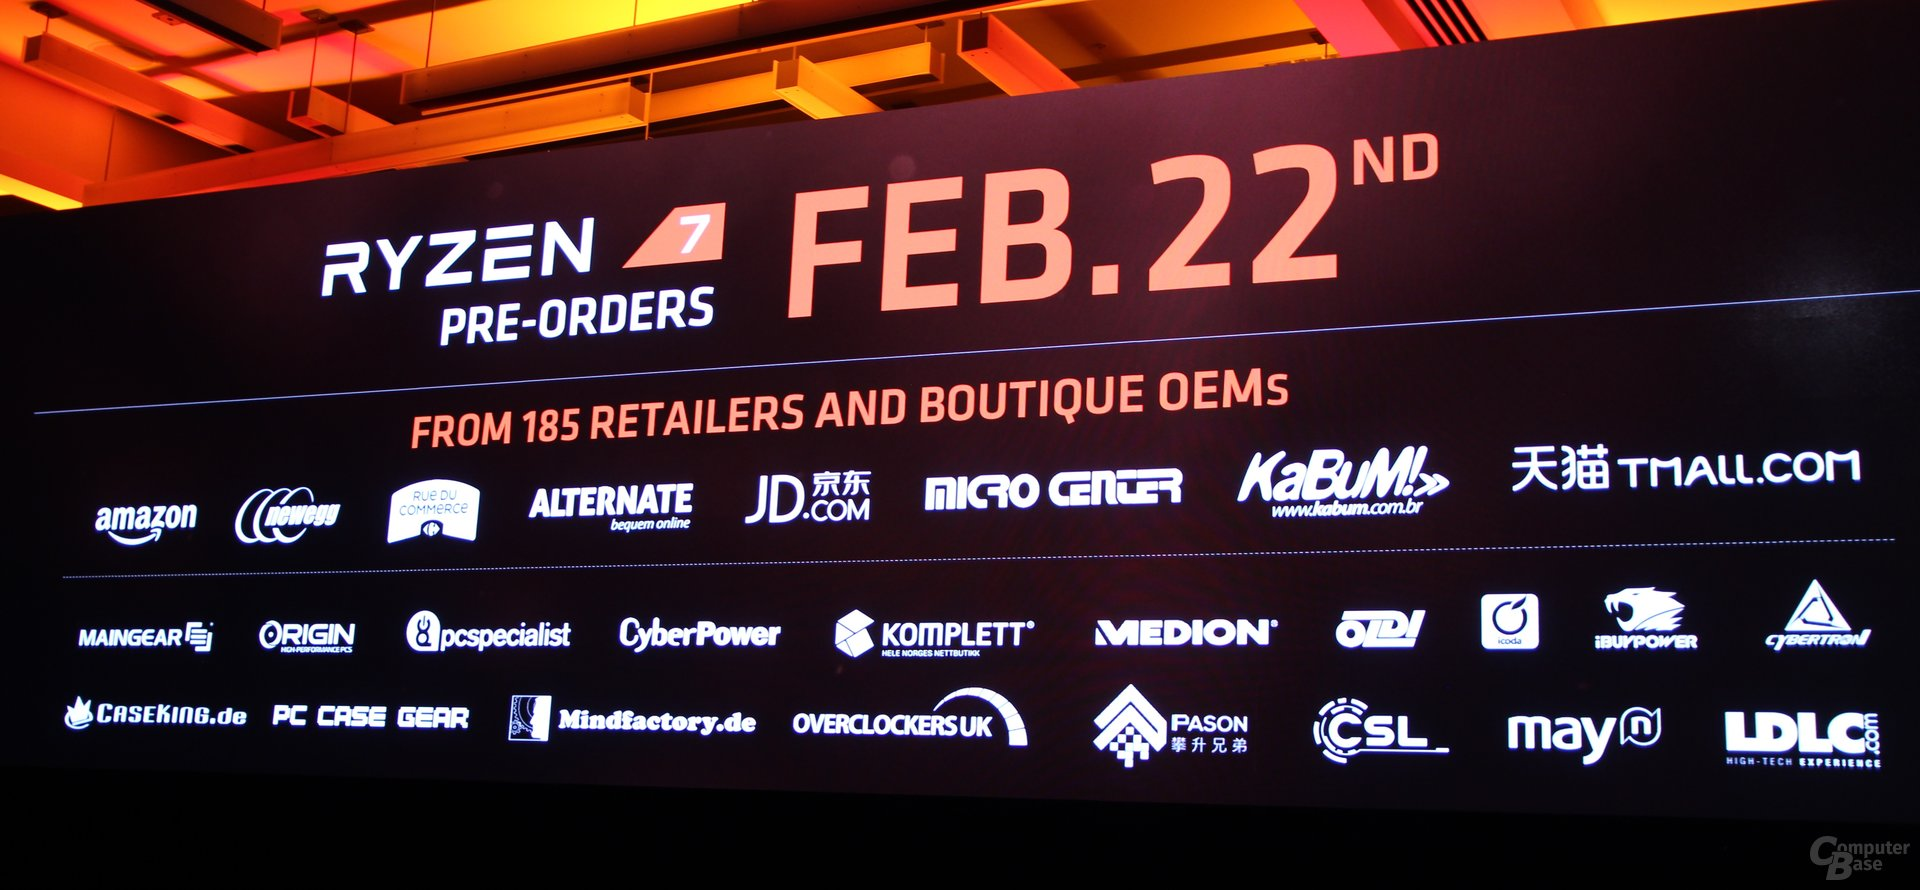 AMD announces Ryzen 7 1800X, 1700X and 1700, preorders start